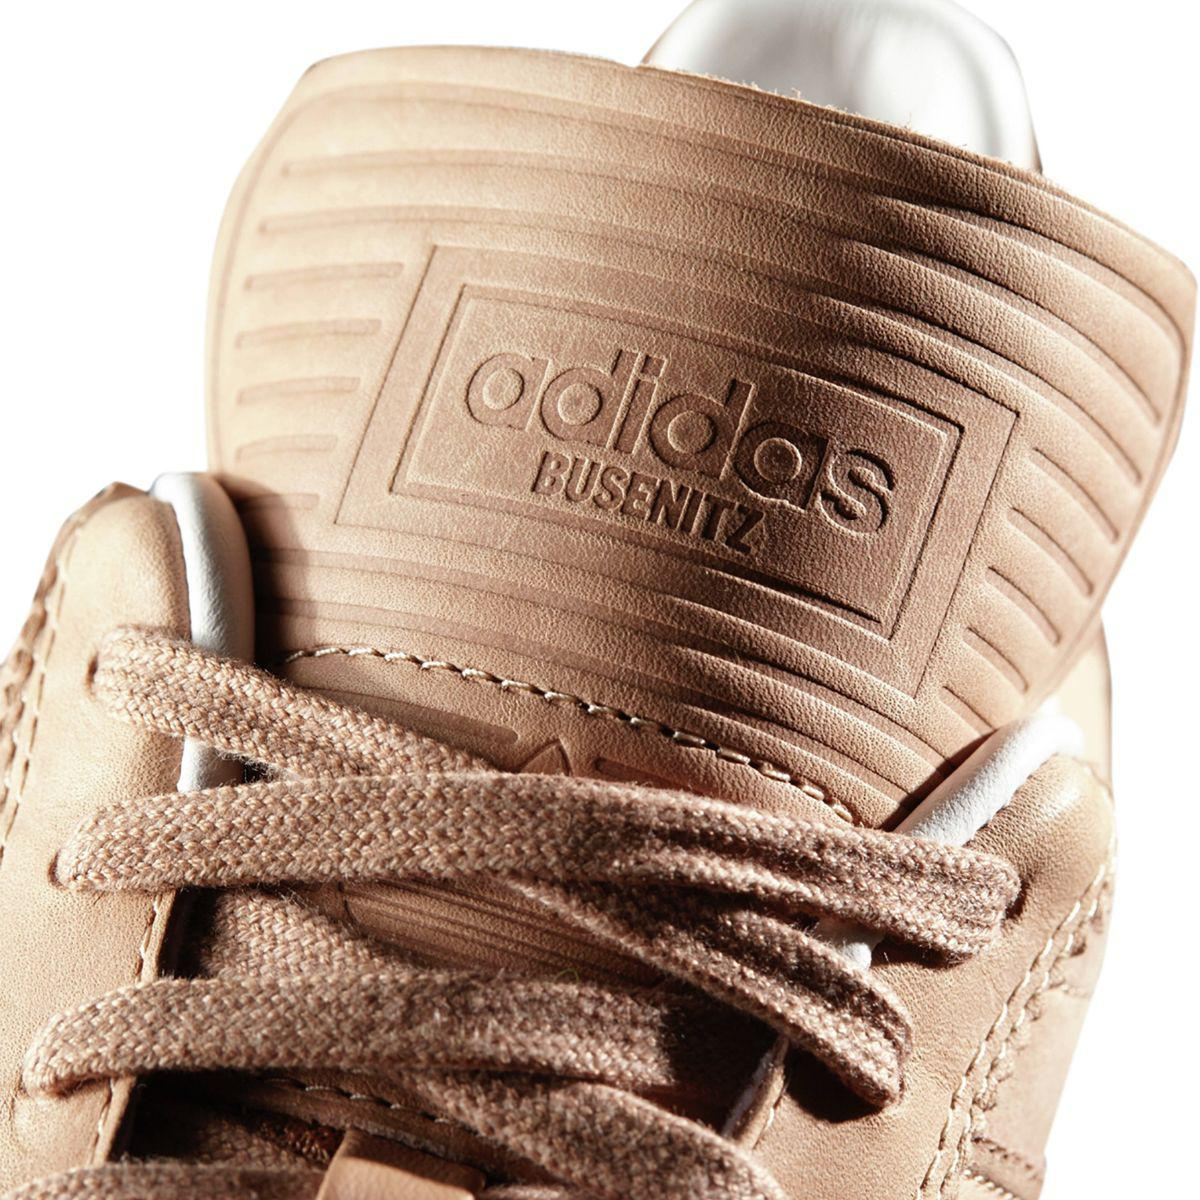 best website 0568c 75870 Lyst - adidas Limited Edition Busenitz Veg Tan Leather Shoe